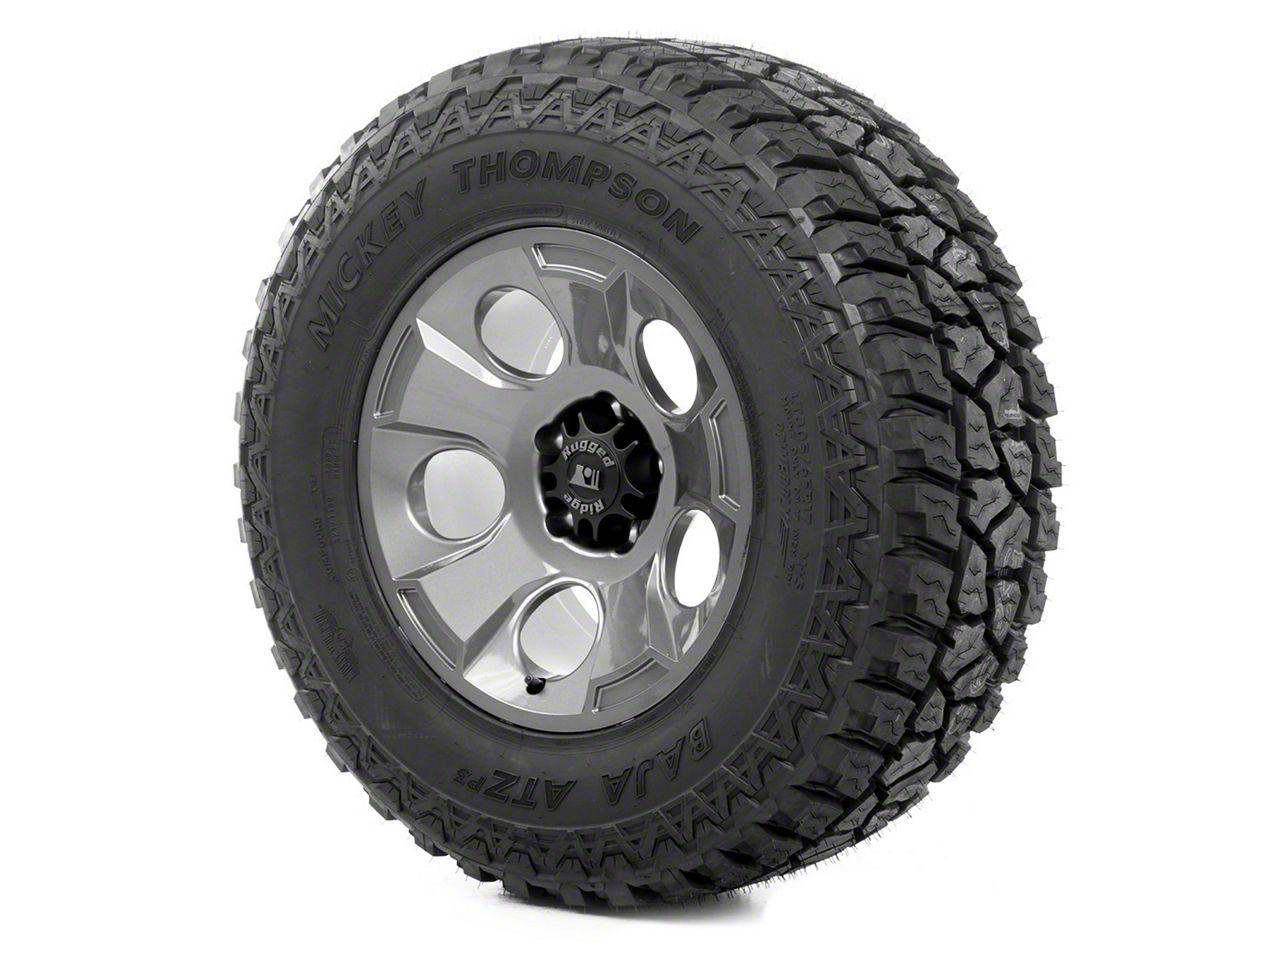 Rugged Ridge Drakon Wheel 17x9 Gun Metal and Mickey Thompson ATZ P3 315/70R17 Tire (07-18 Jeep Wrangler JK)